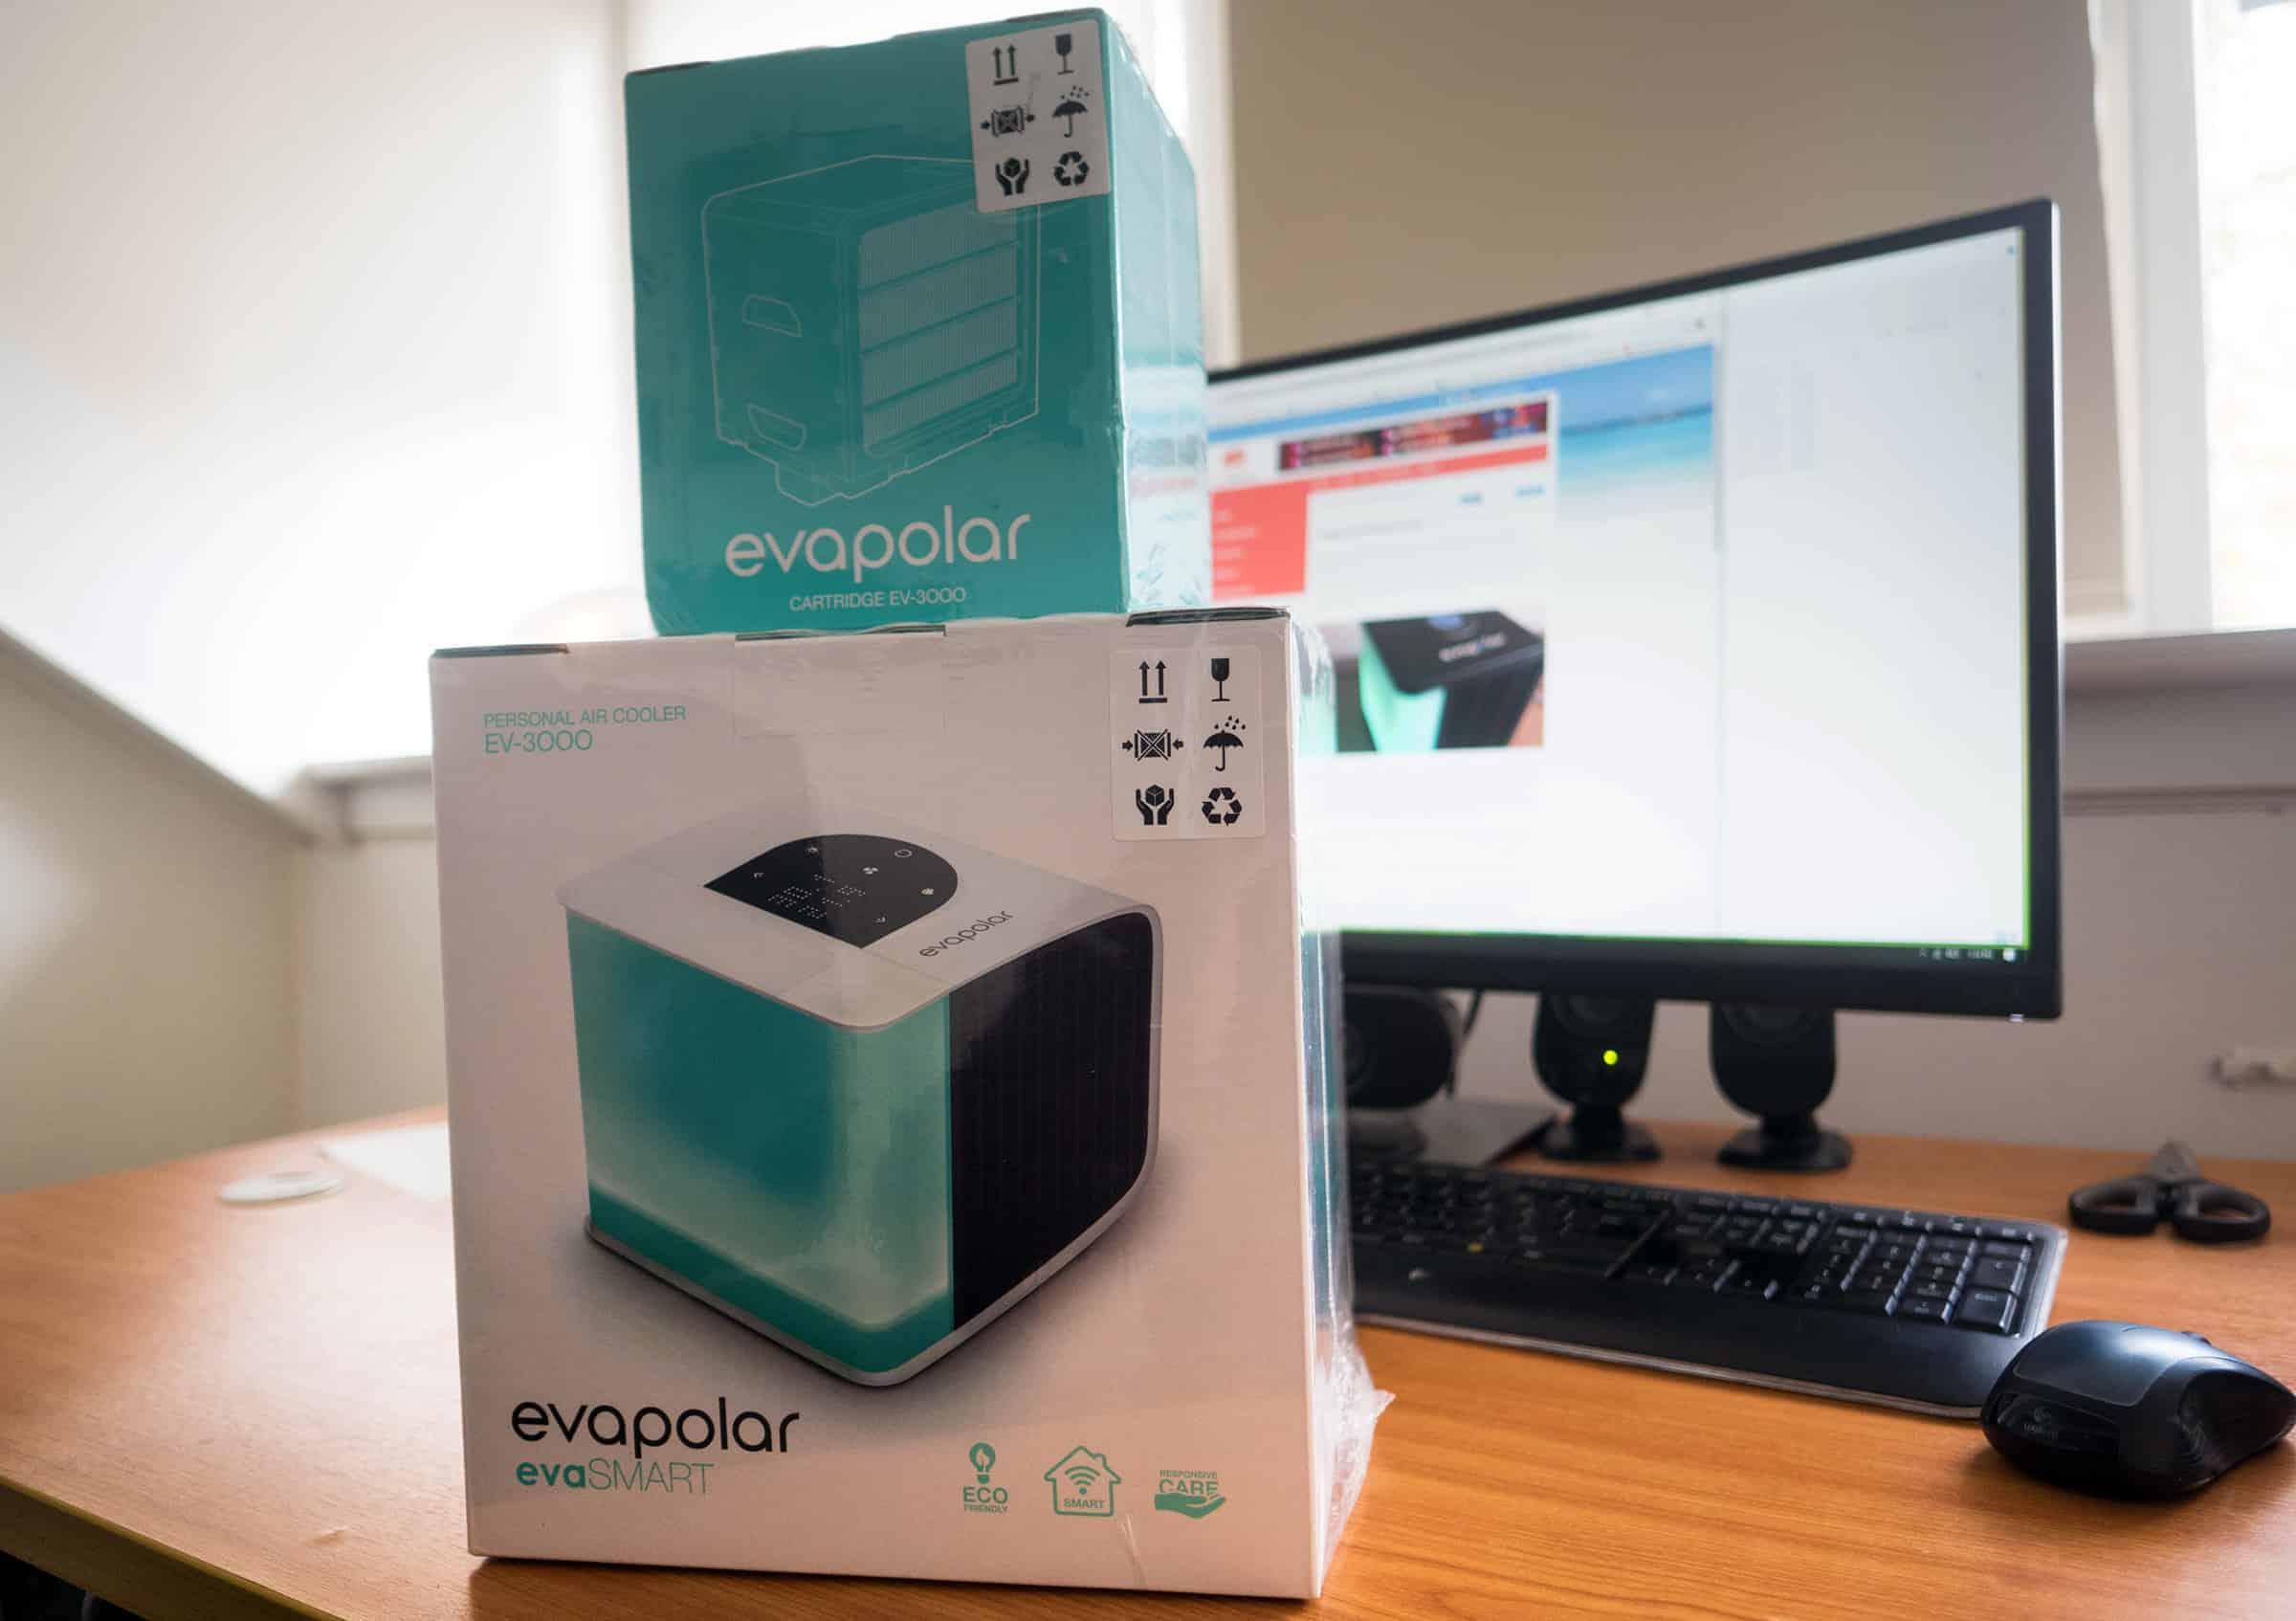 Evapolar 2 unboxing